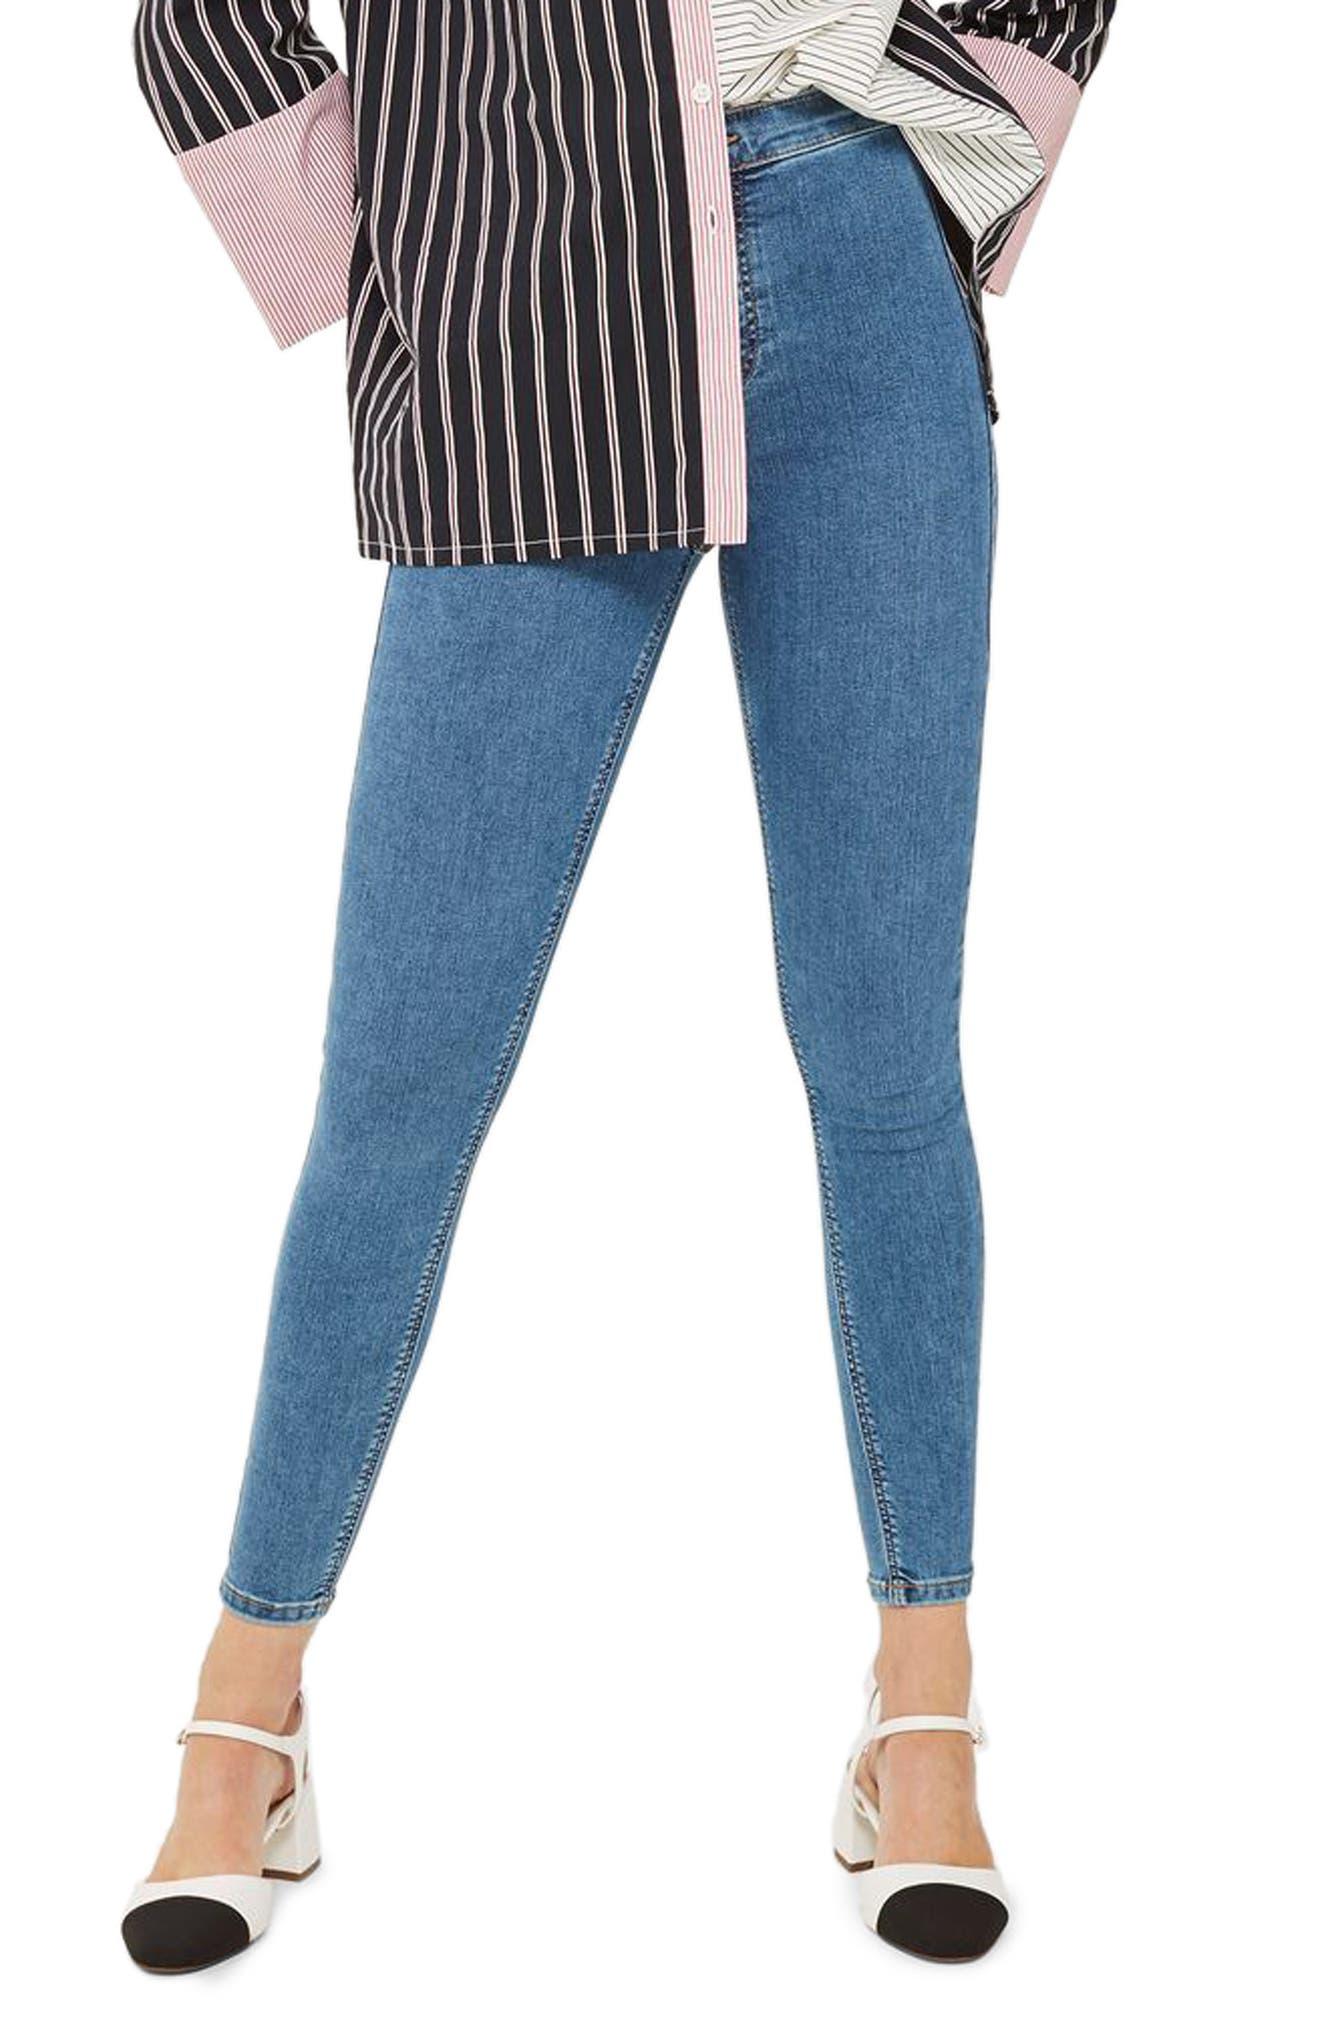 Joni High Waist Skinny Jeans,                         Main,                         color, Mid Denim